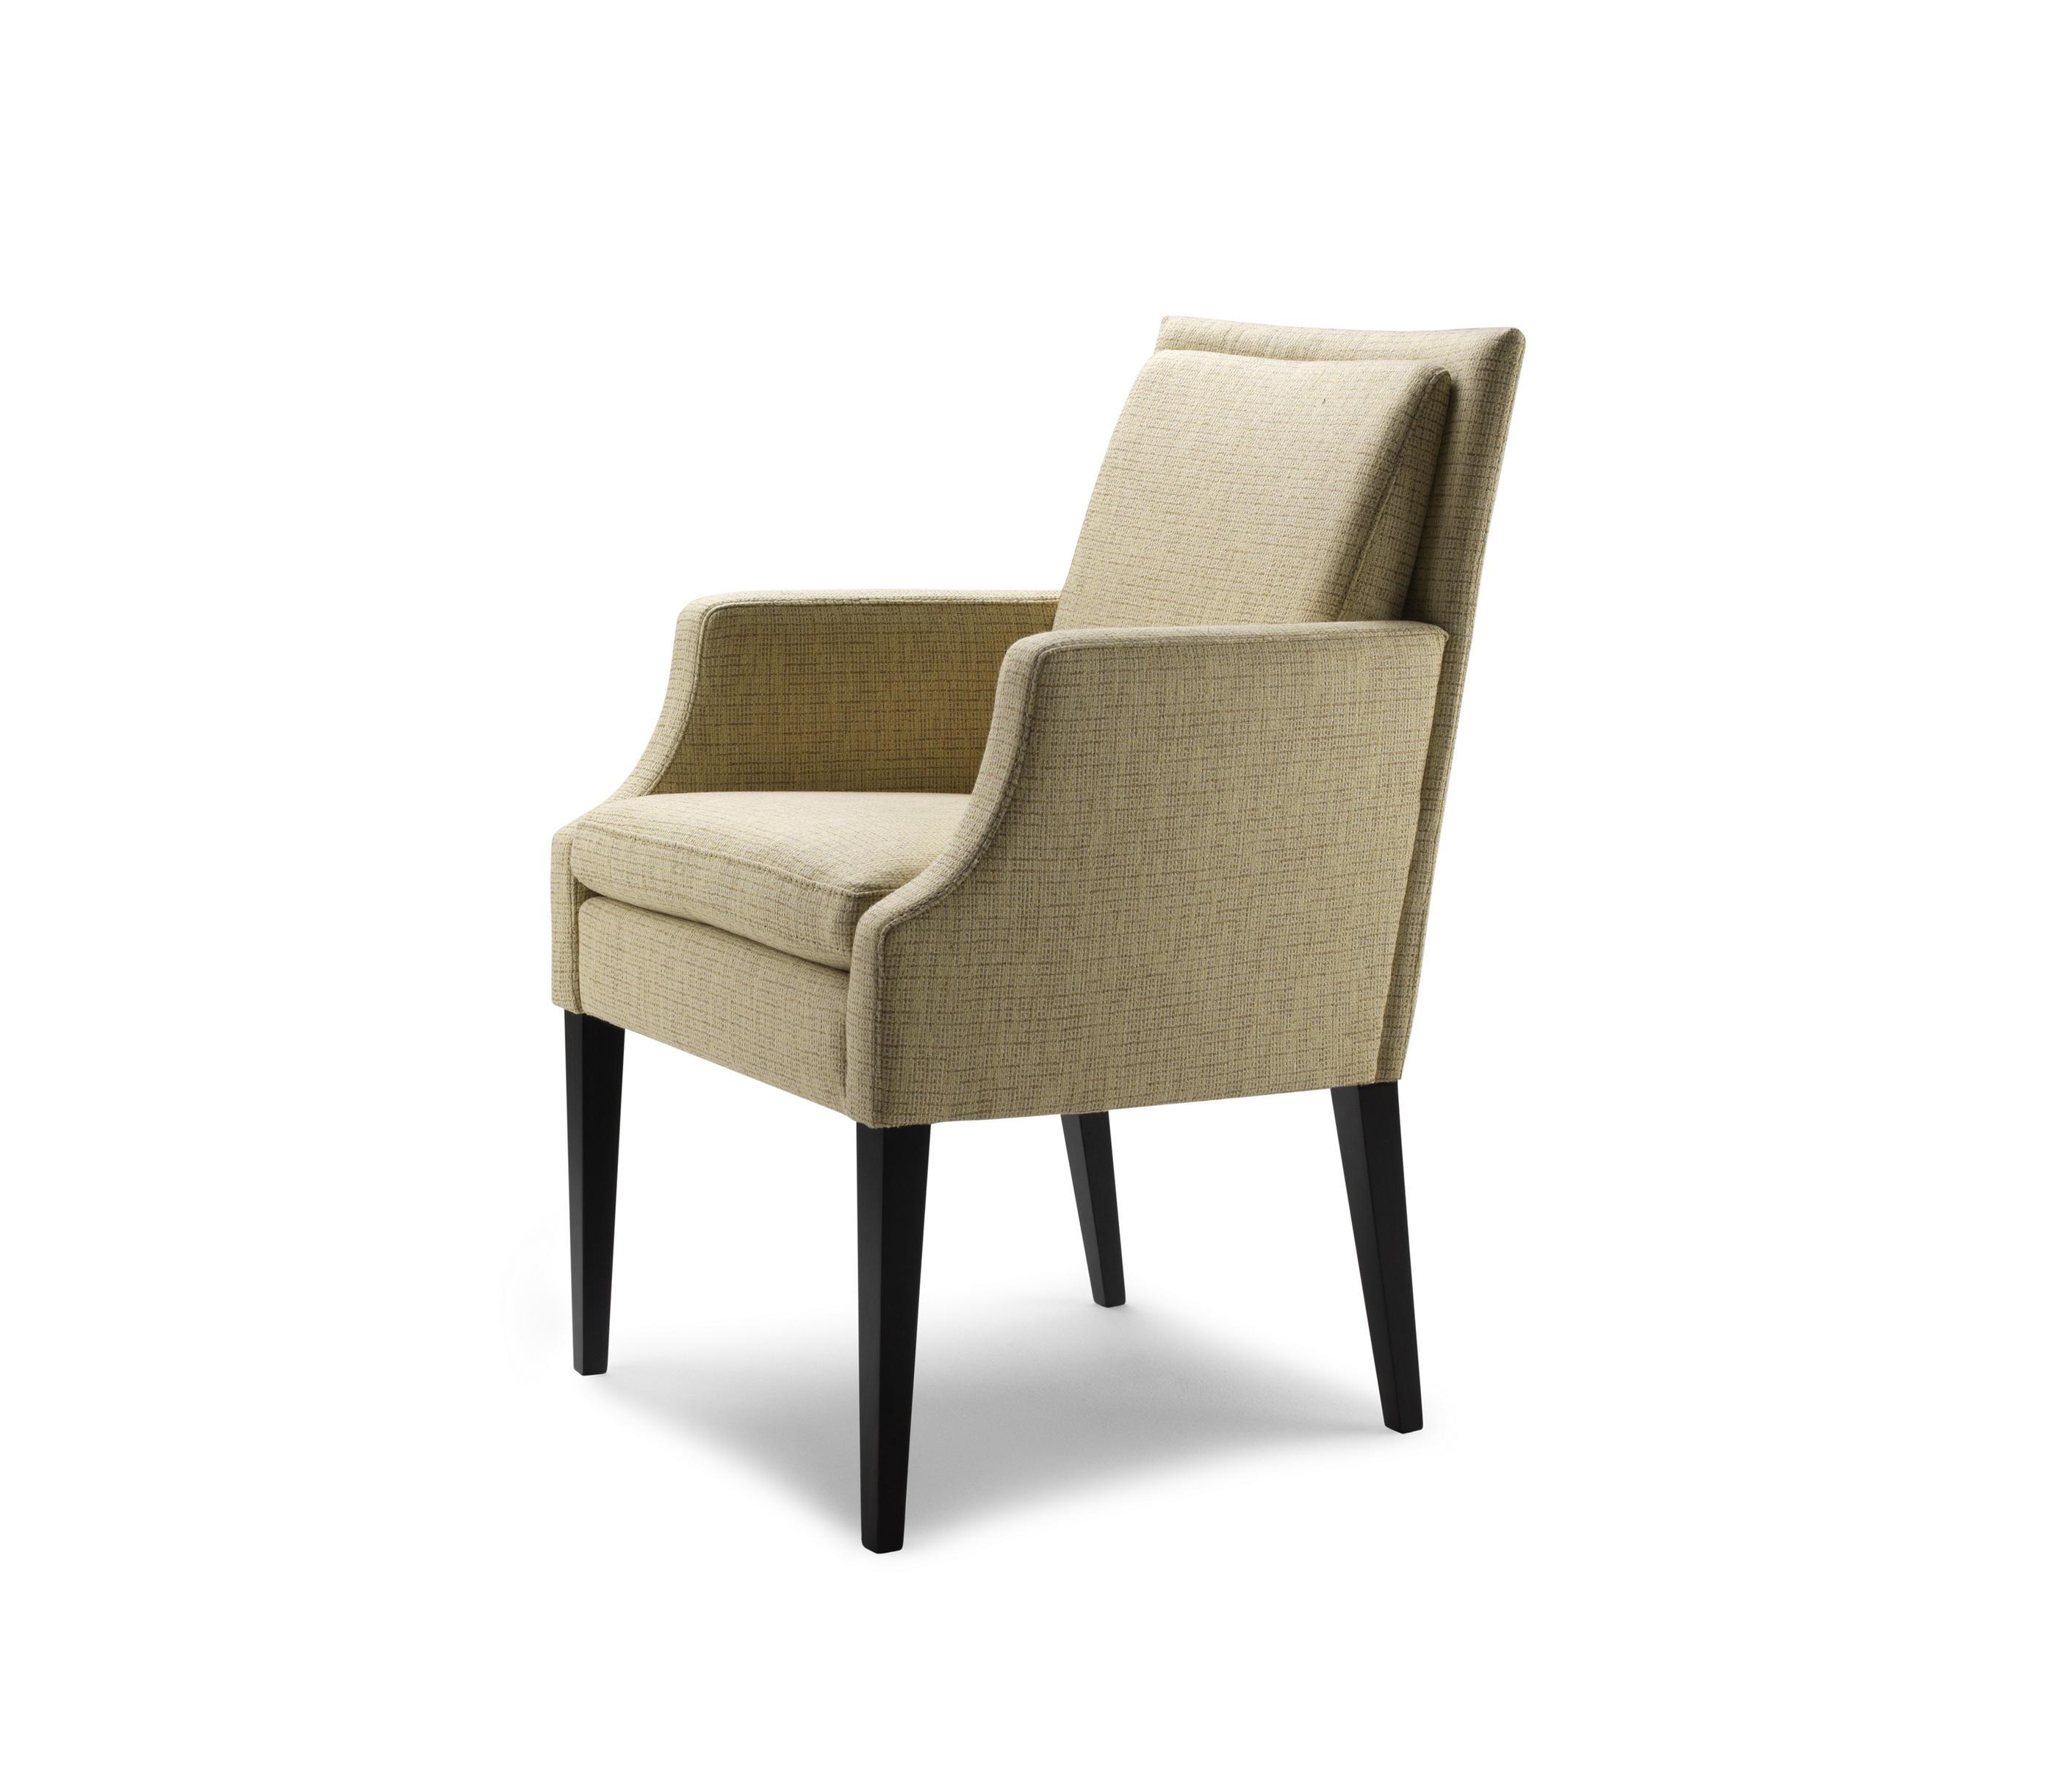 LABDA MULTI CUSHION - Restaurant chairs from Bench ...